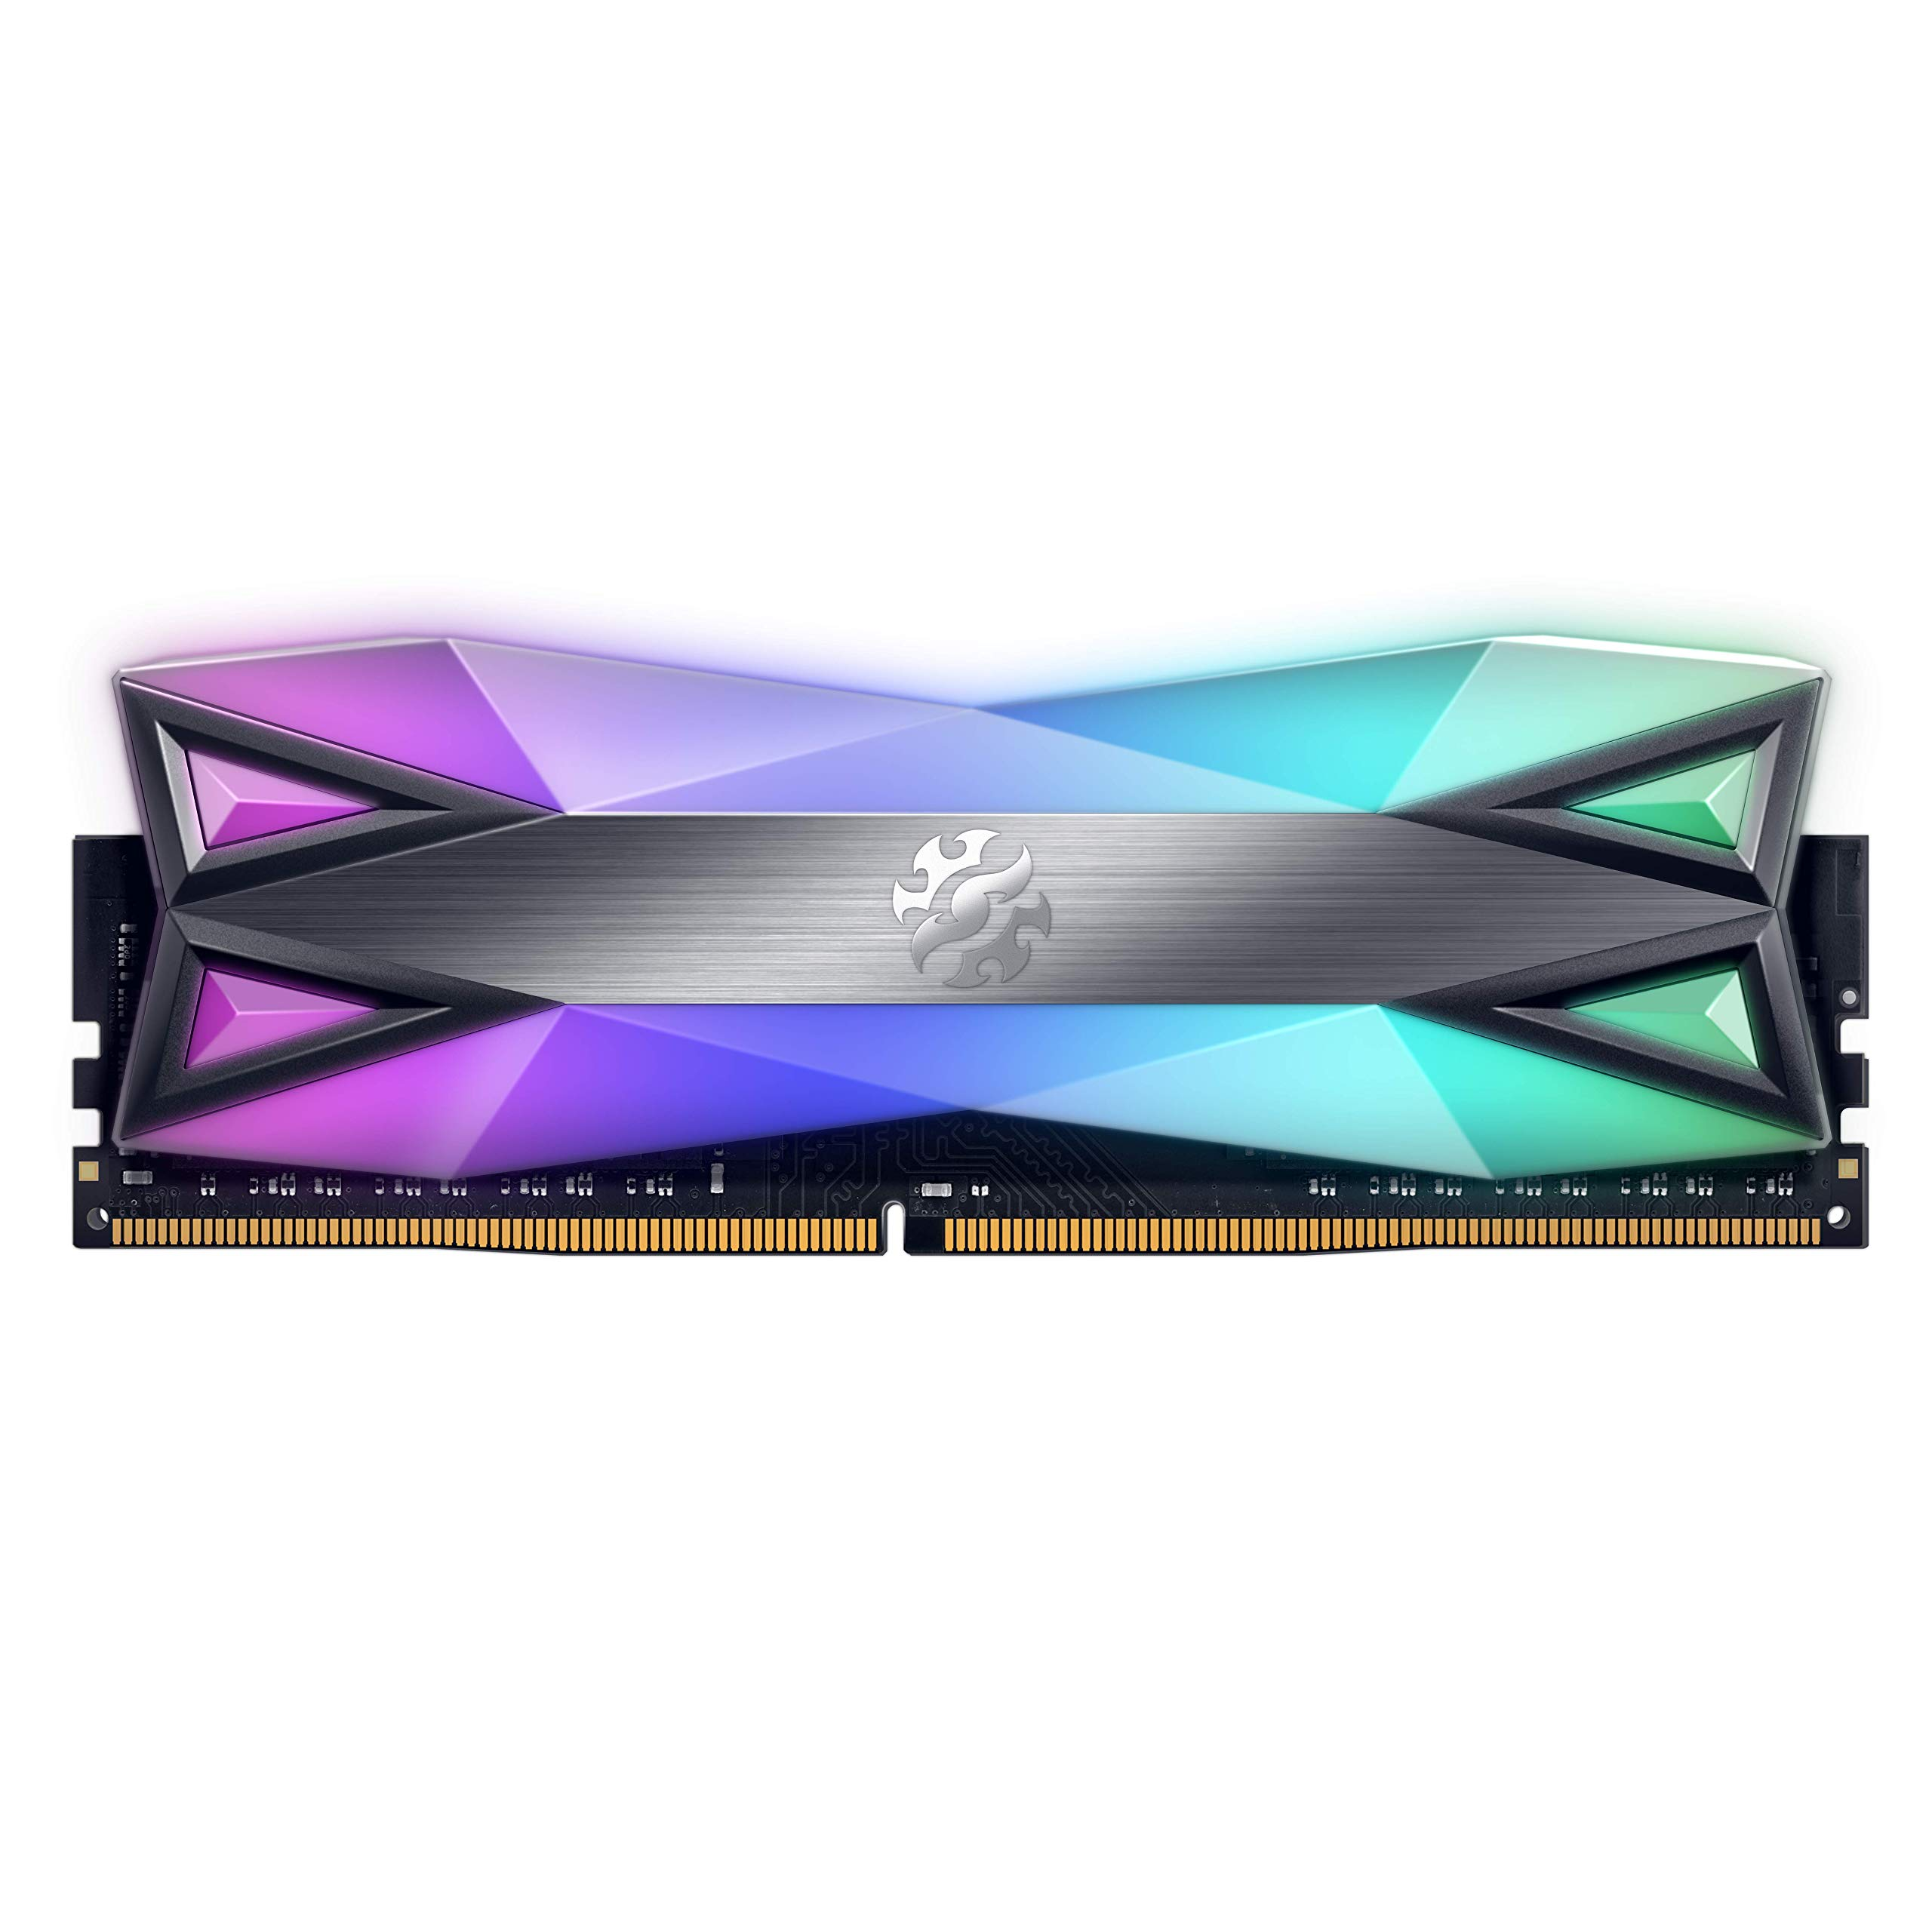 Memoria XPG DDR4 D60G RGB 16GB 2x8GB 3600MHz PC4-28800 Deskt